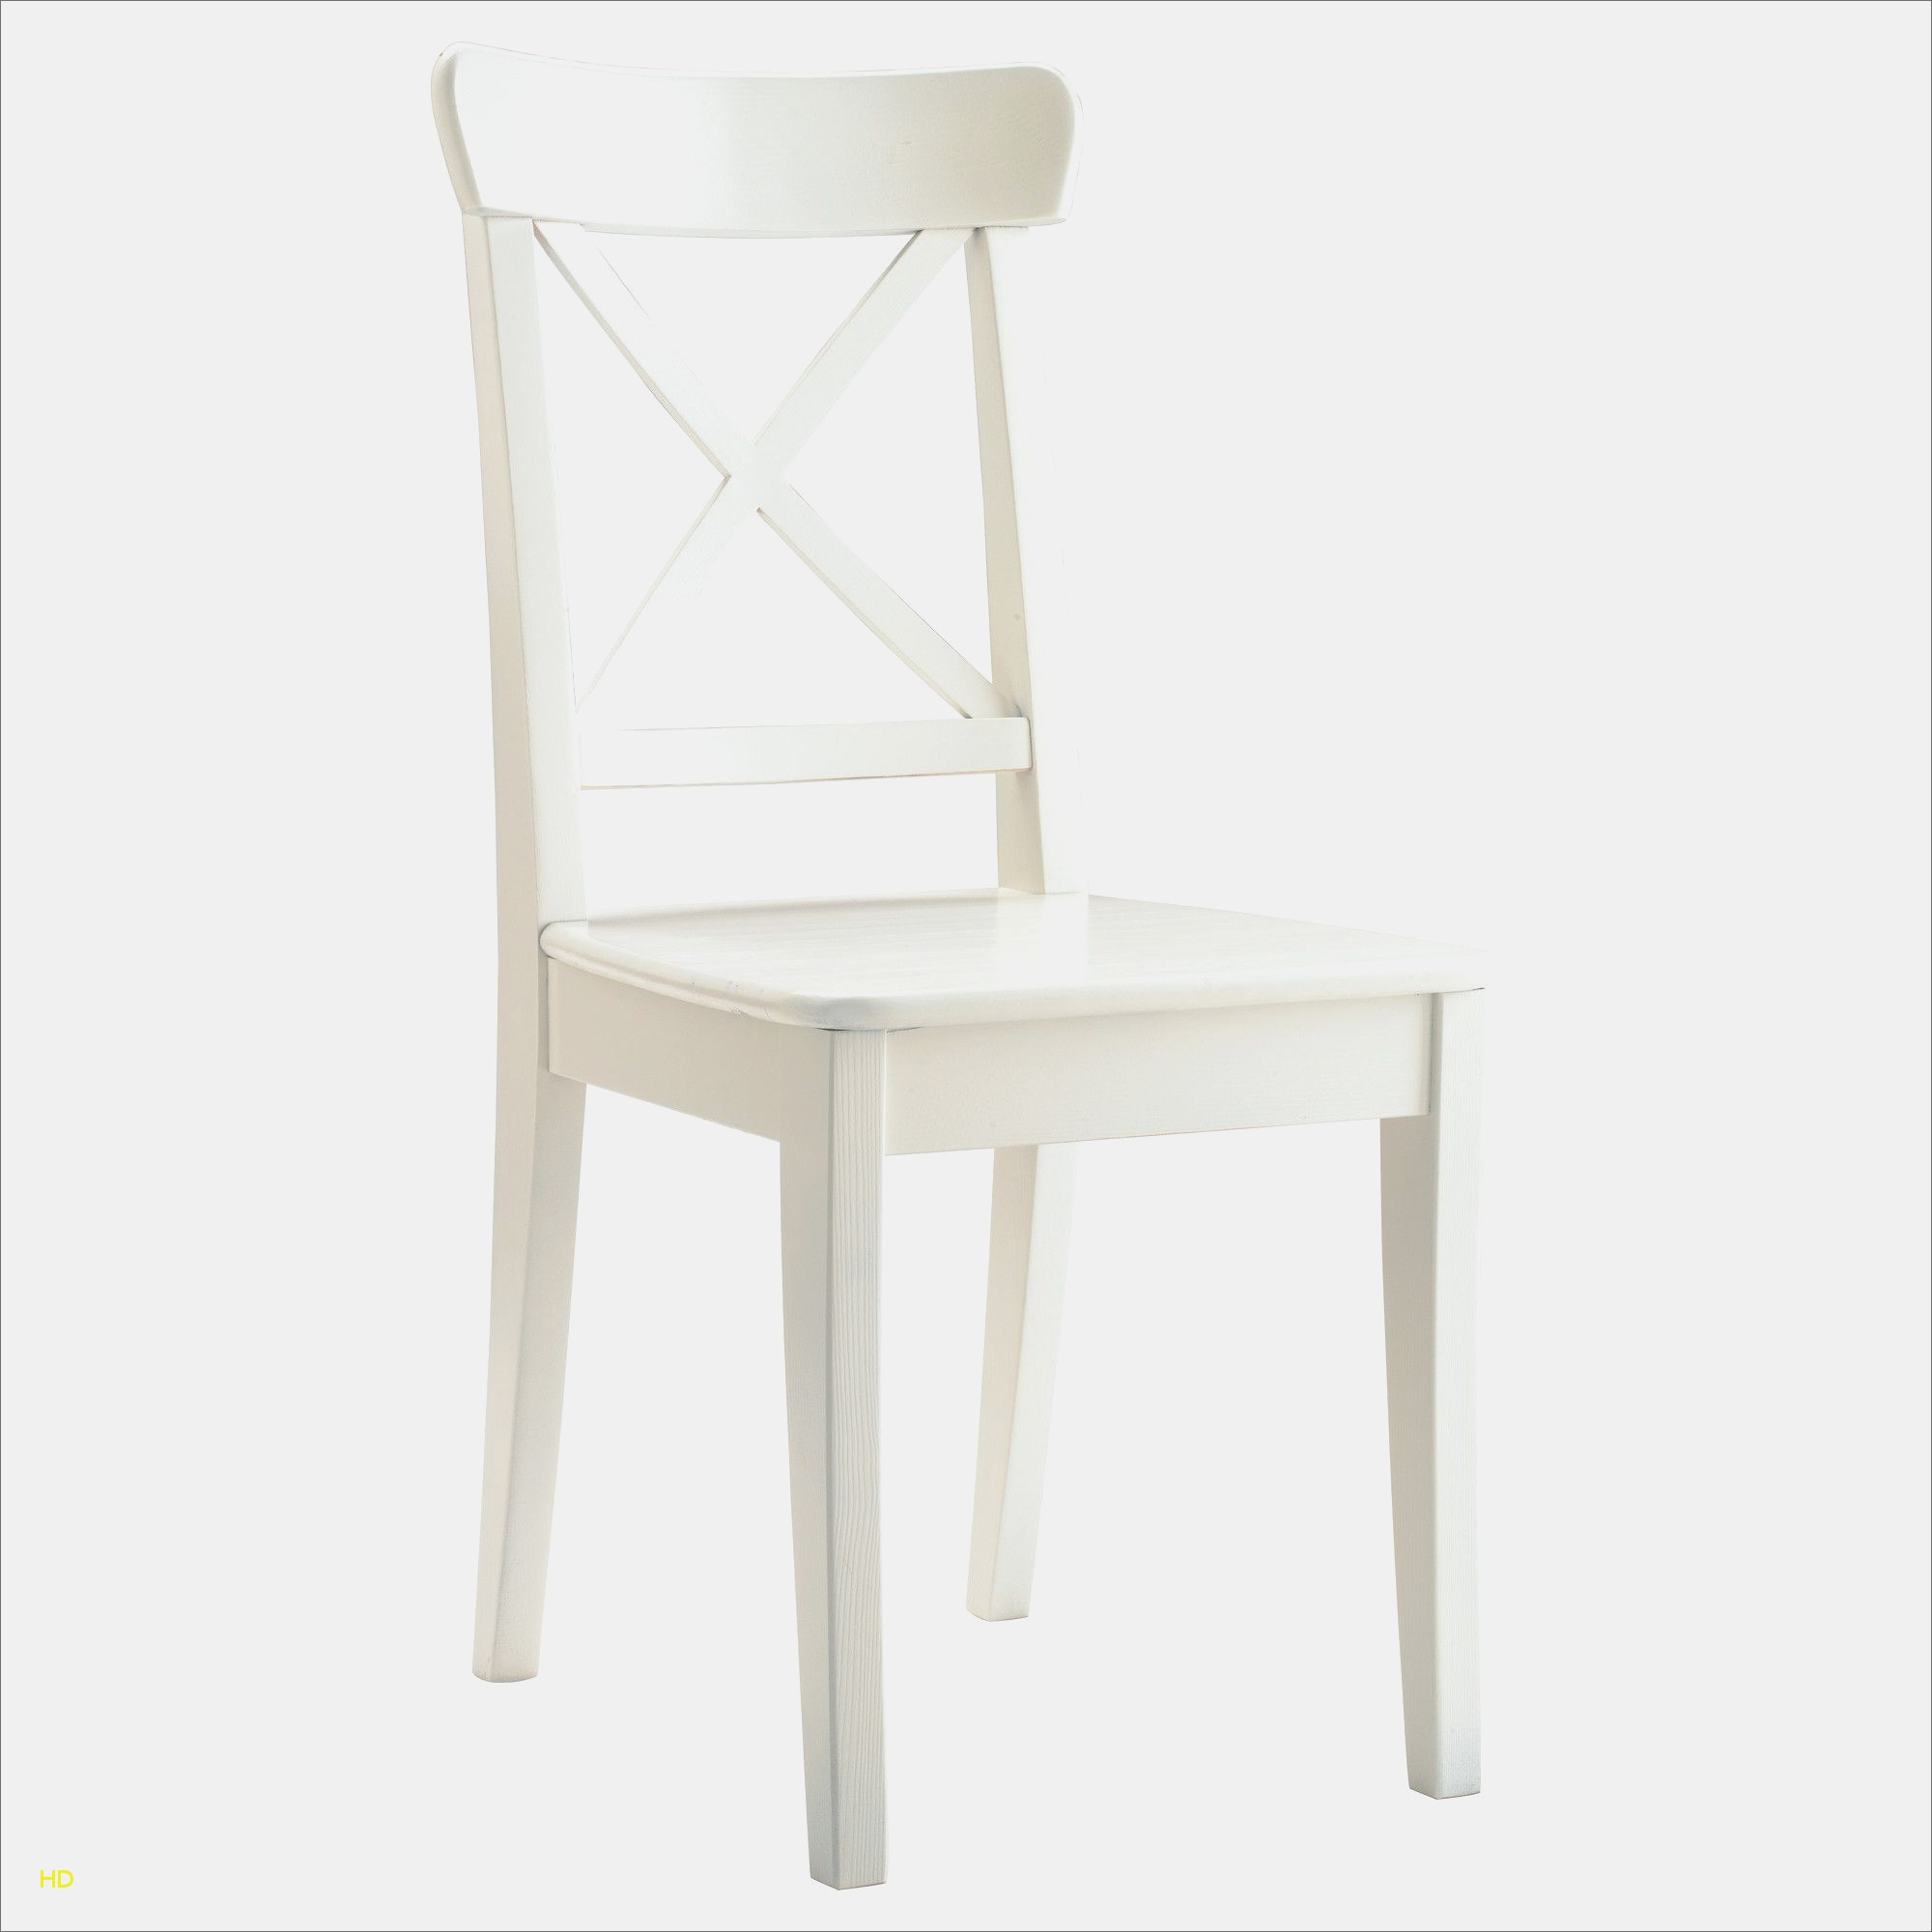 Table Pliante Carrefour Beau Collection Tabouret Carrefour Best Chaise Longue Carrefour Chaise Pliante